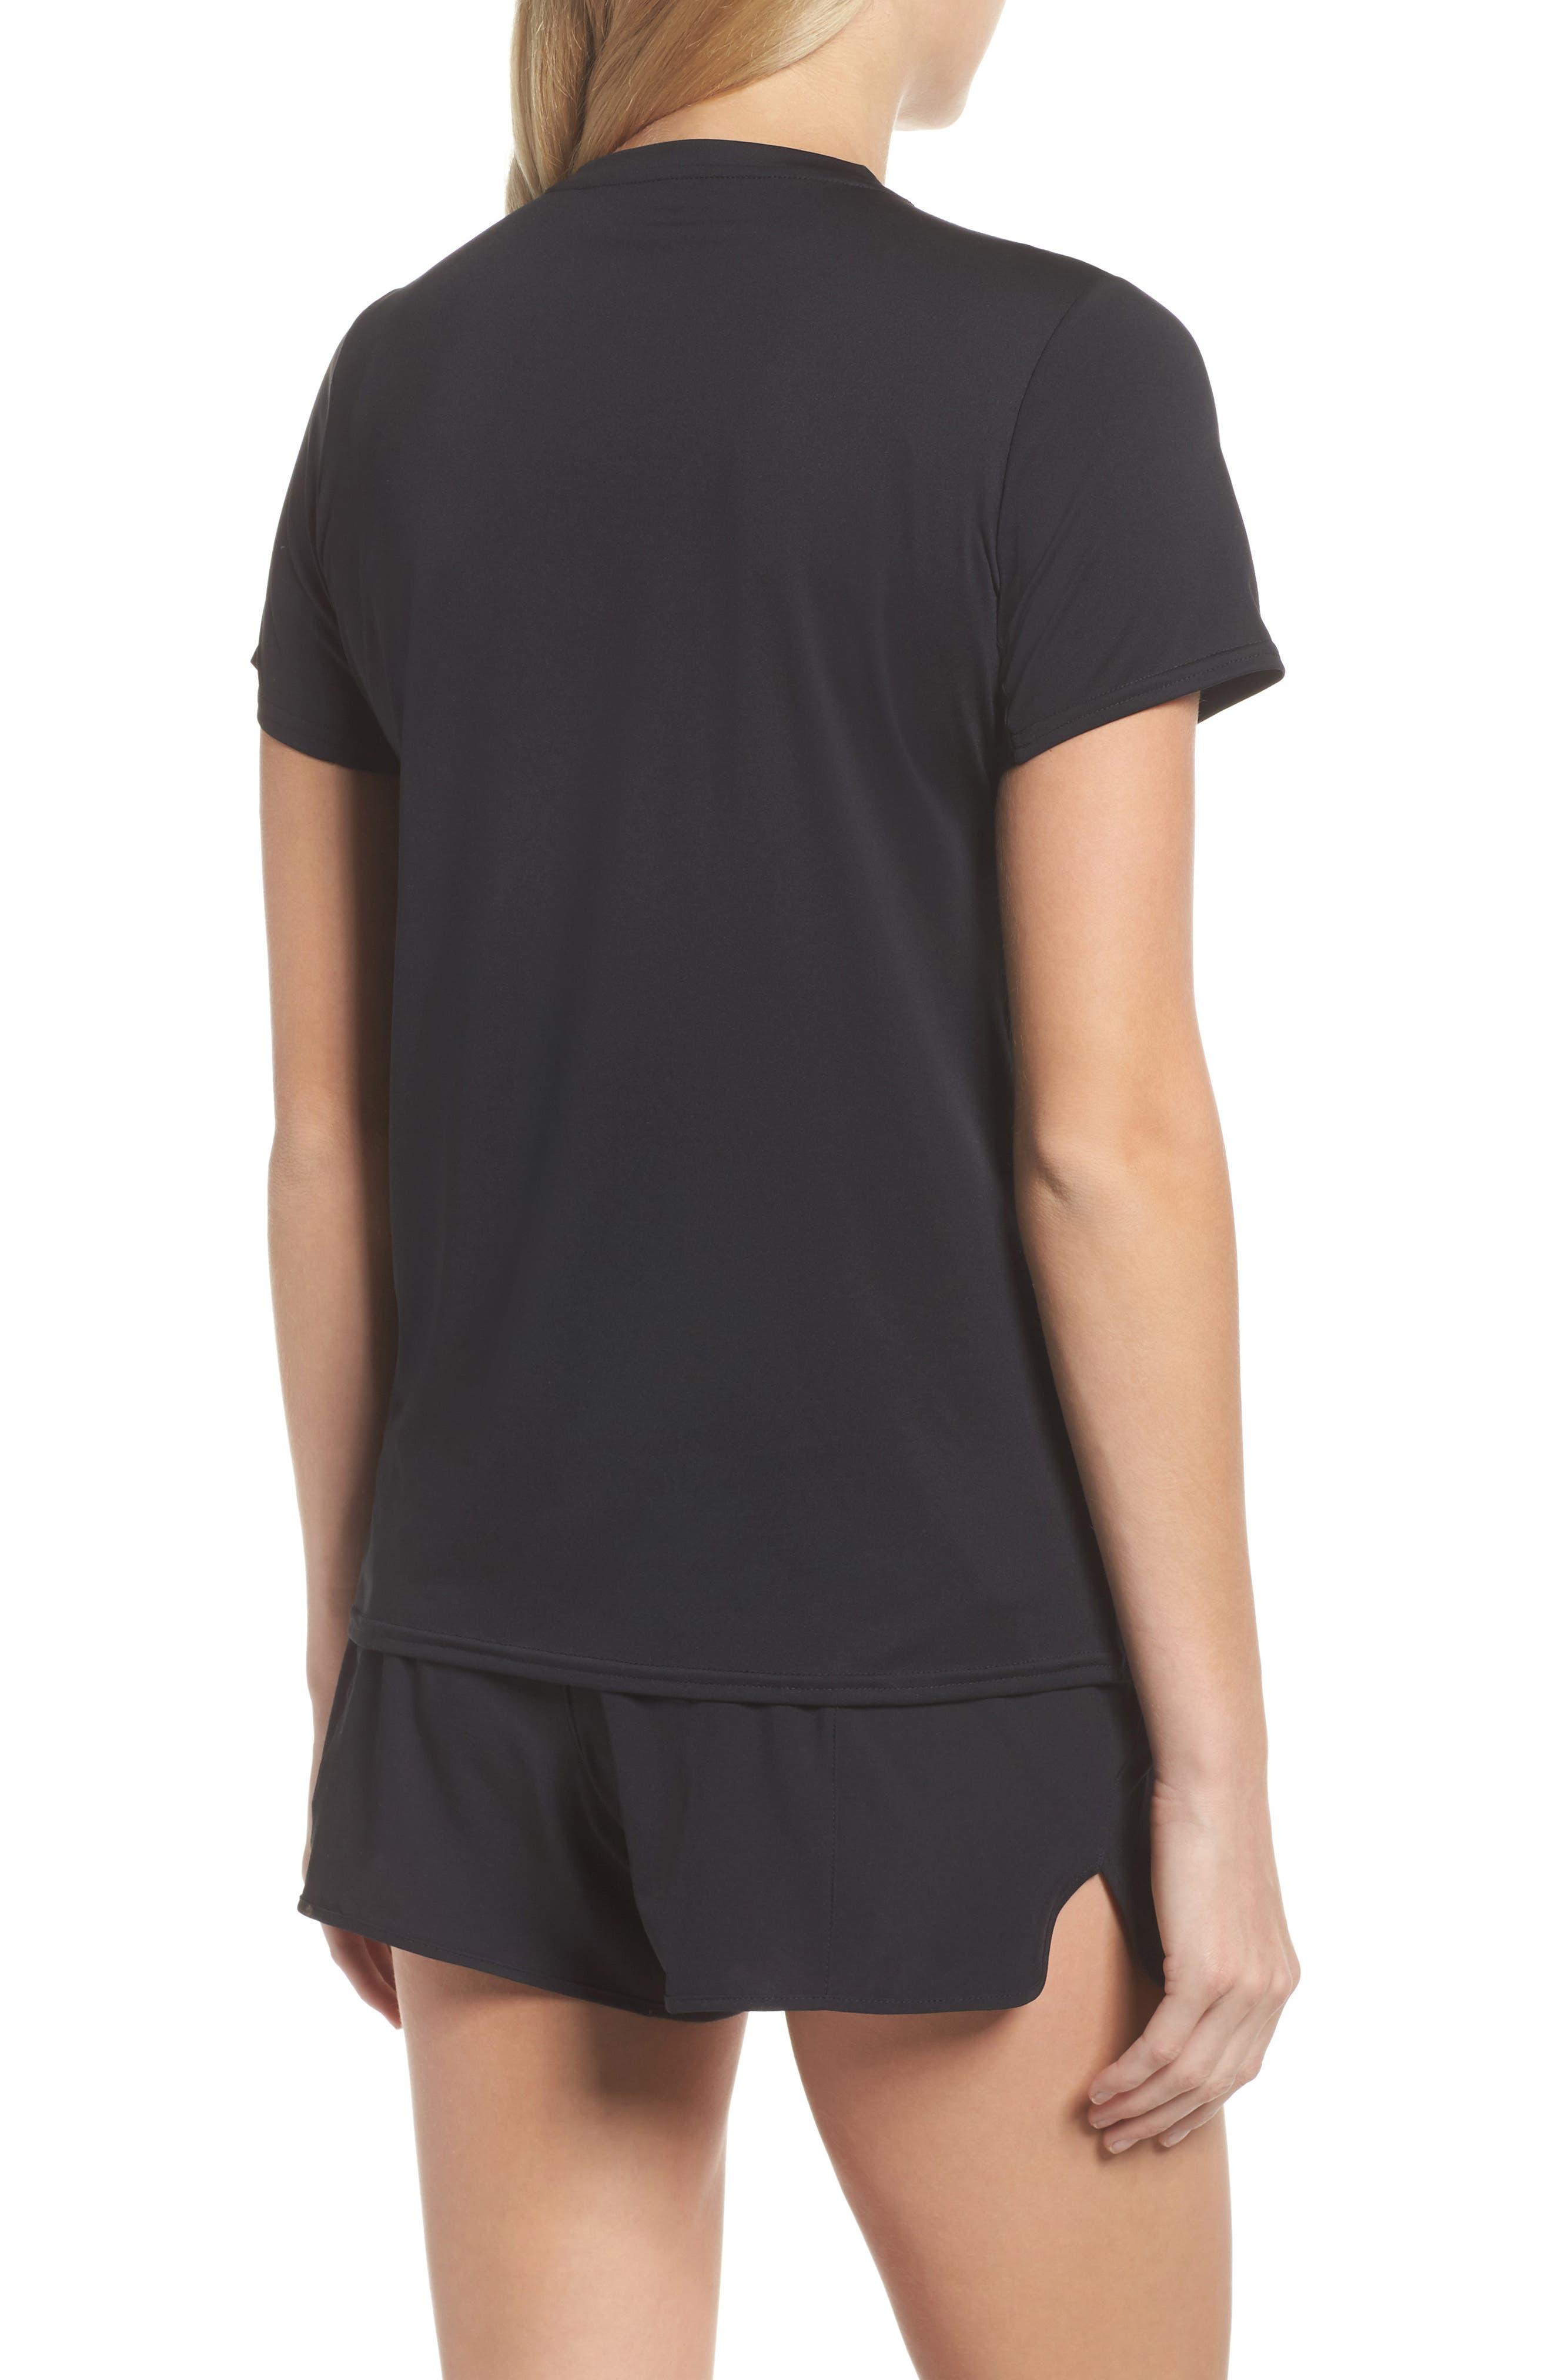 Capilene<sup>®</sup> Dailty T-Shirt,                             Alternate thumbnail 2, color,                             Black